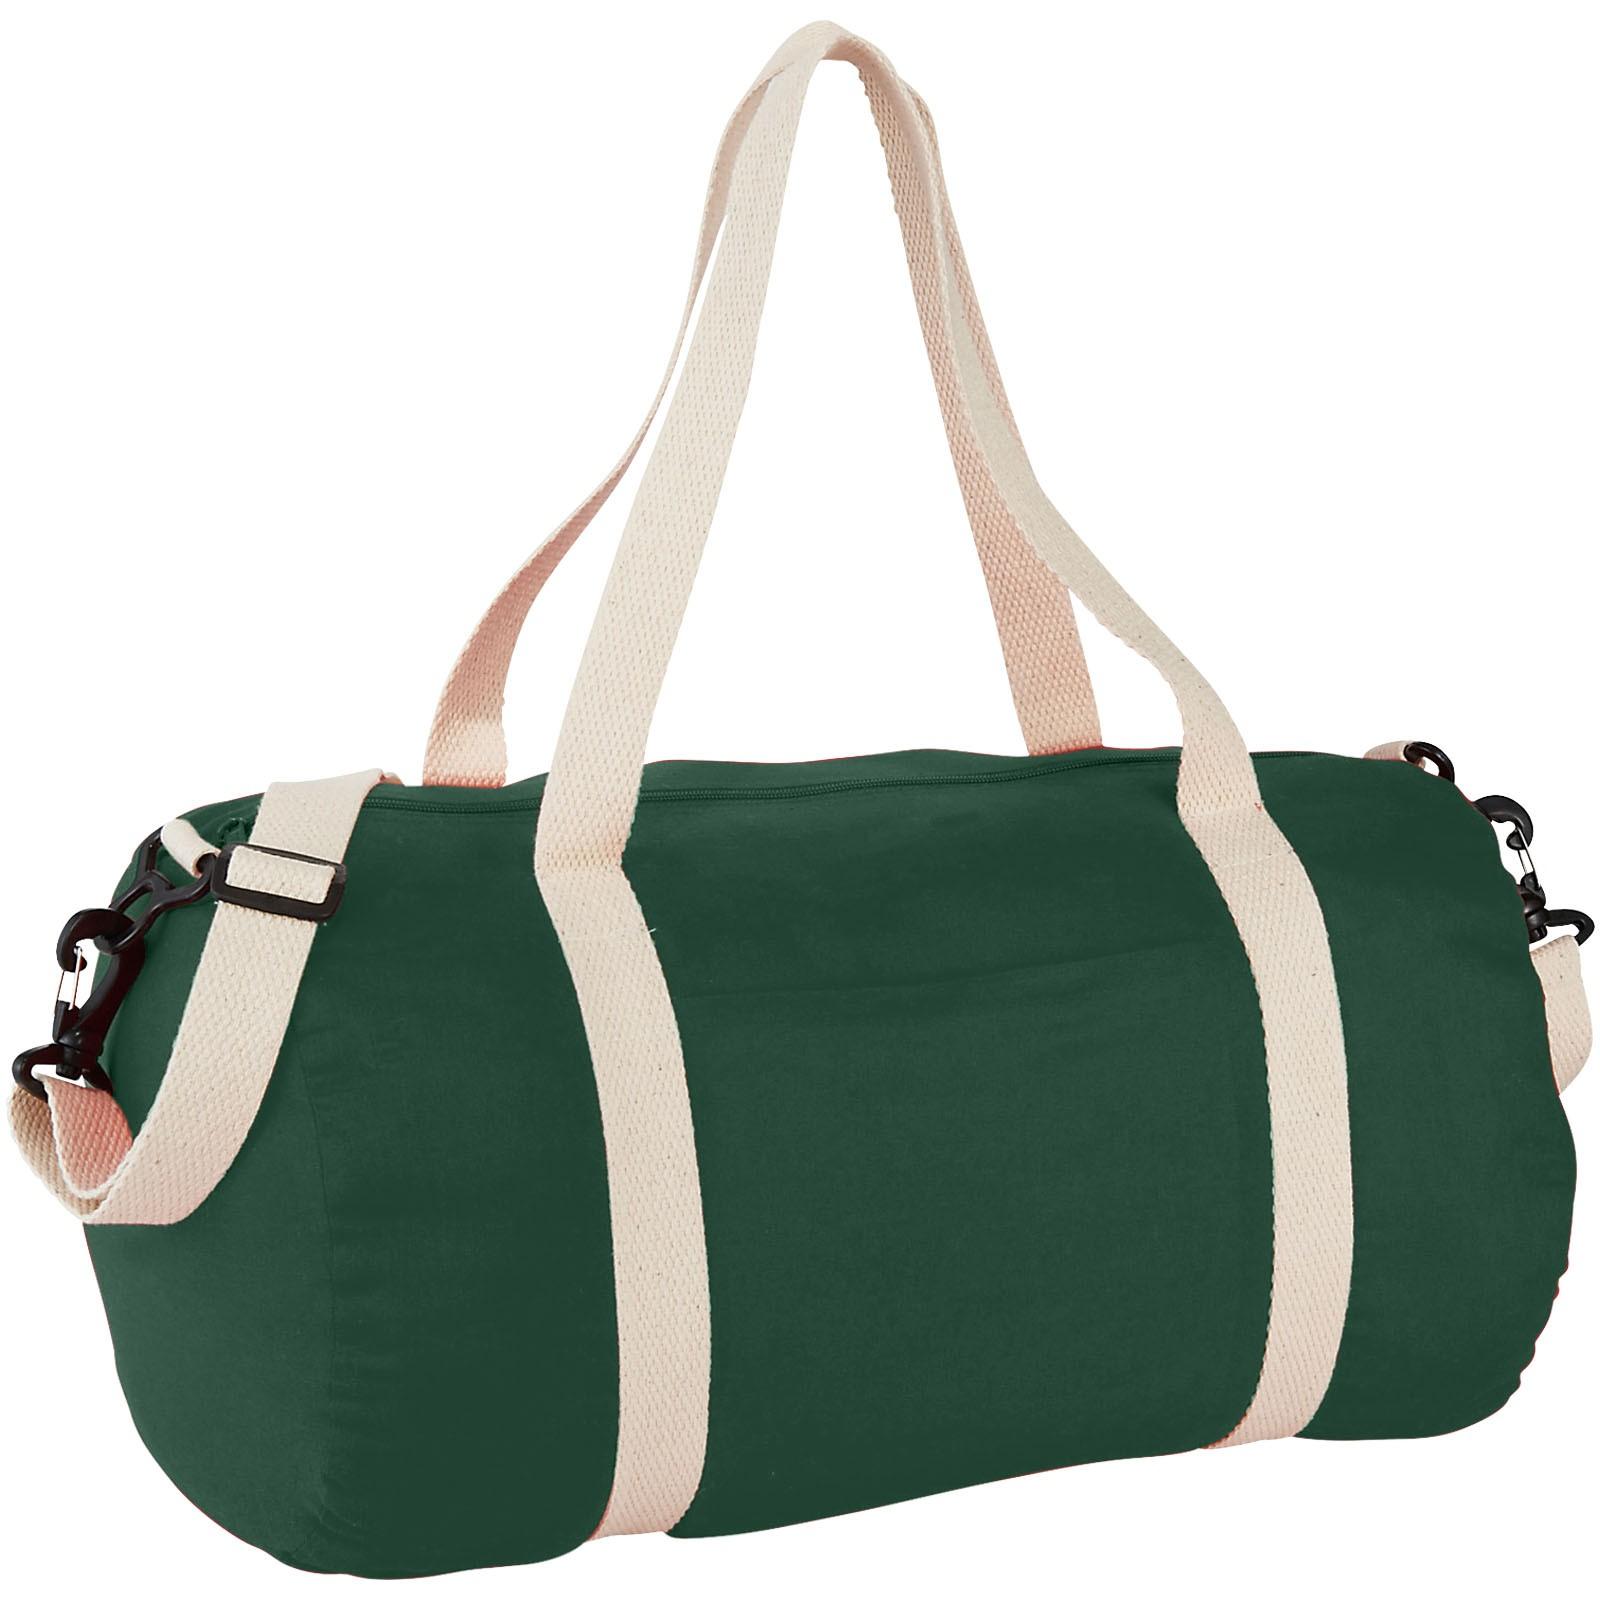 Cochichuate cotton barrel duffel bag - Forest green